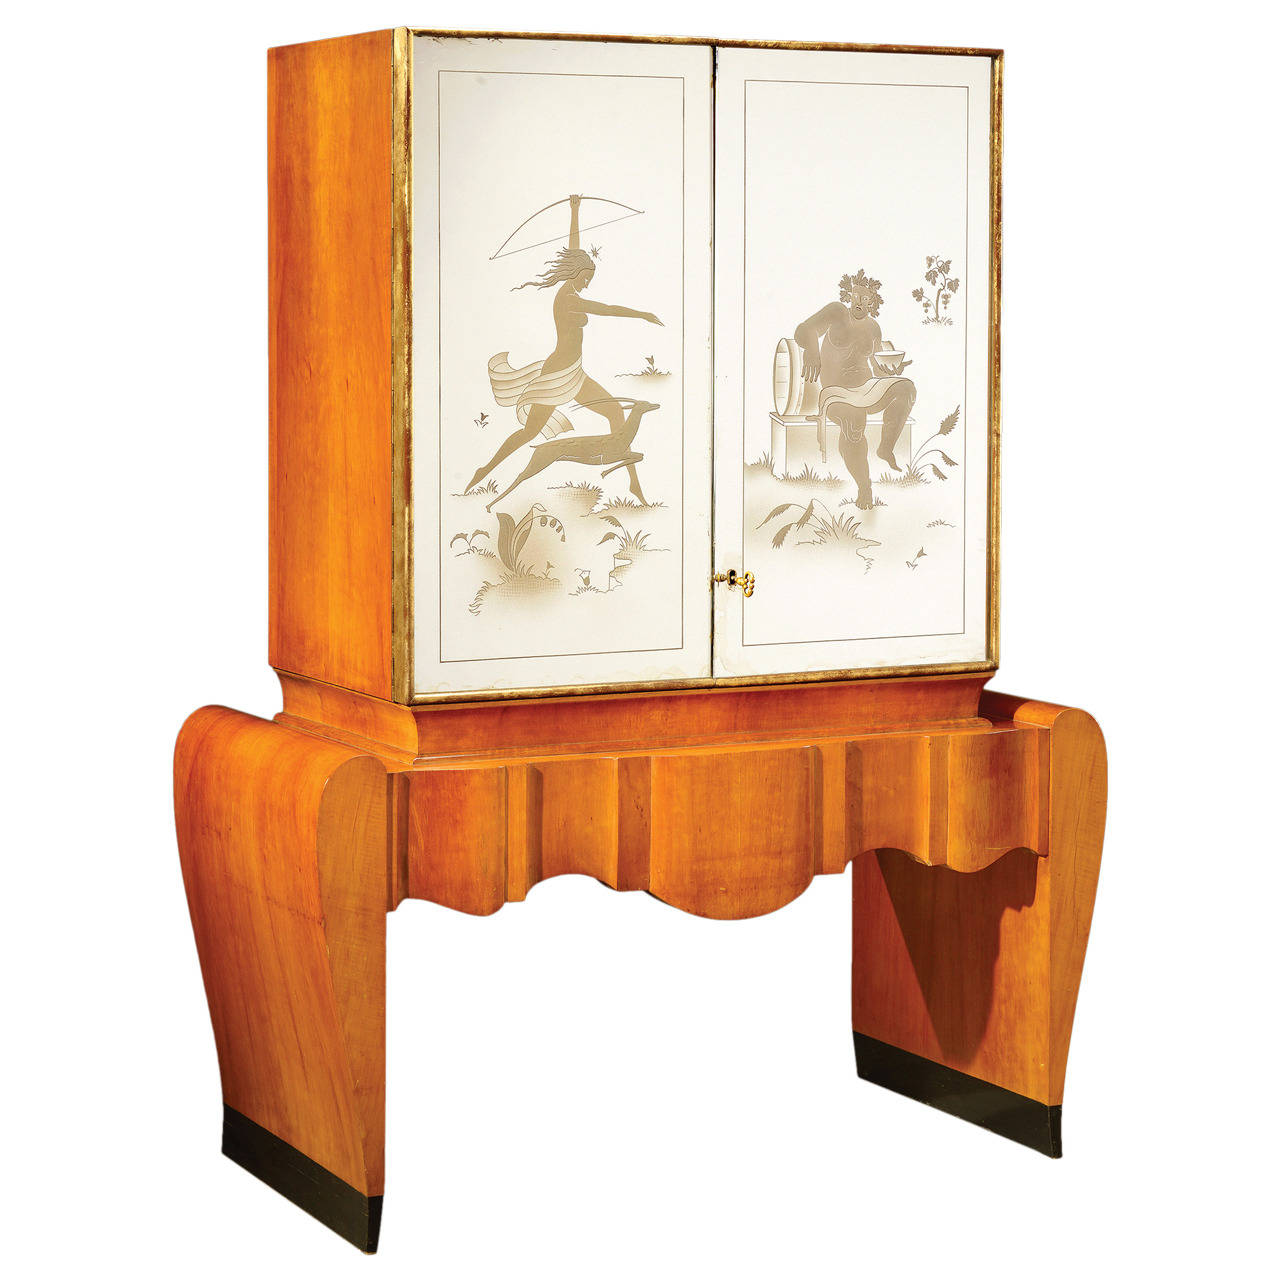 Cool Art Deco Kitchen Cabinets: Stunning Art Deco Italian Bar Cabinet